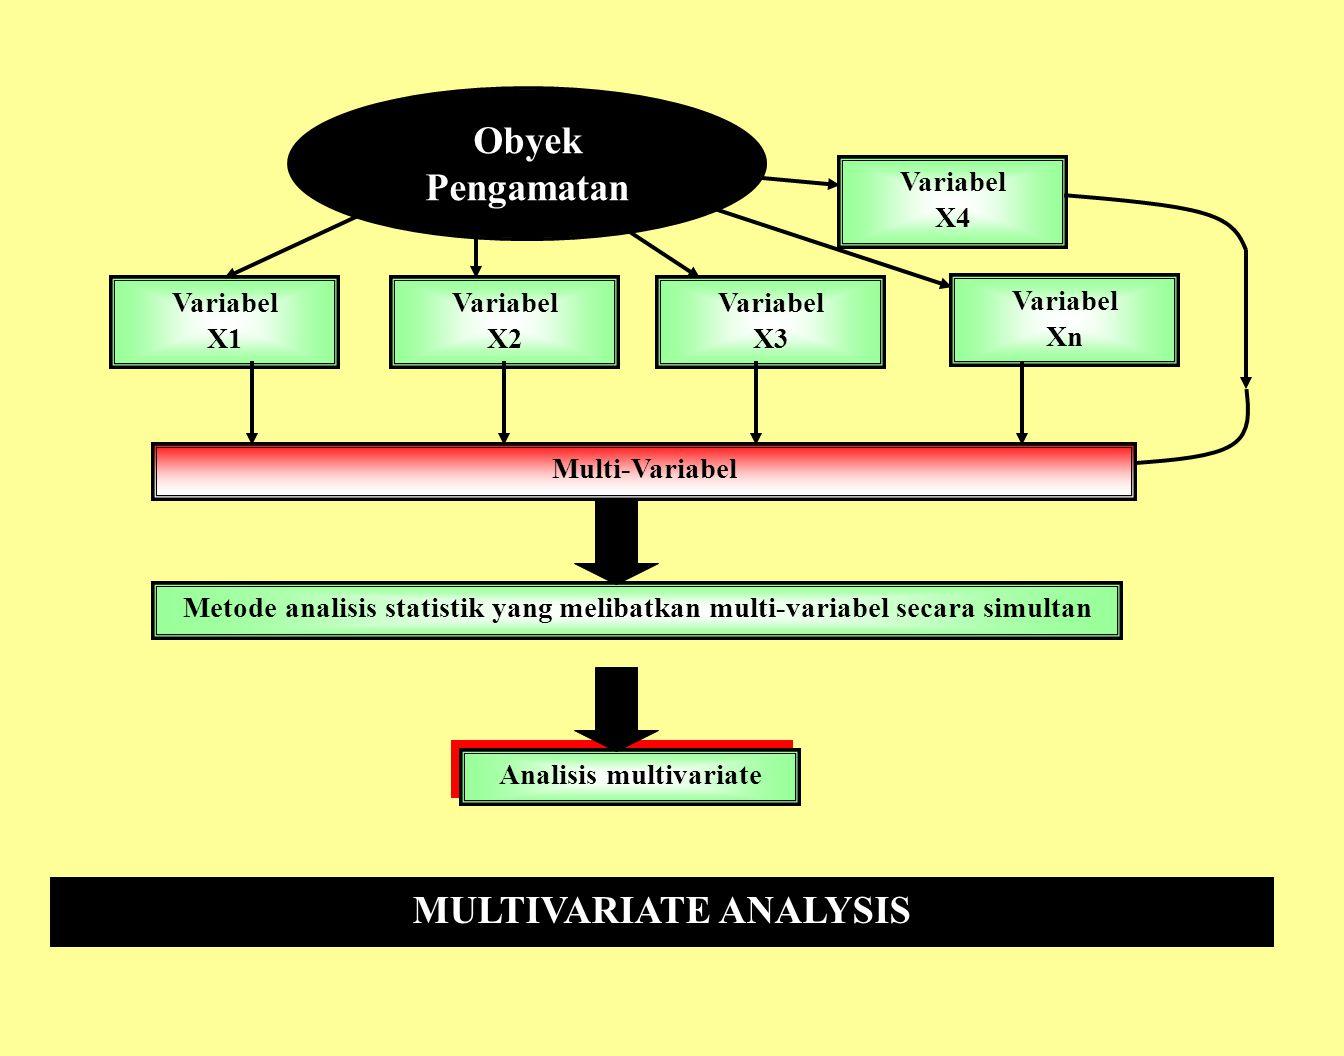 MULTIVARIATE ANALYSIS Obyek Pengamatan Variabel X1 Variabel X4 Variabel Xn Variabel X3 Variabel X2 Multi-Variabel Metode analisis statistik yang melibatkan multi-variabel secara simultan Analisis multivariate